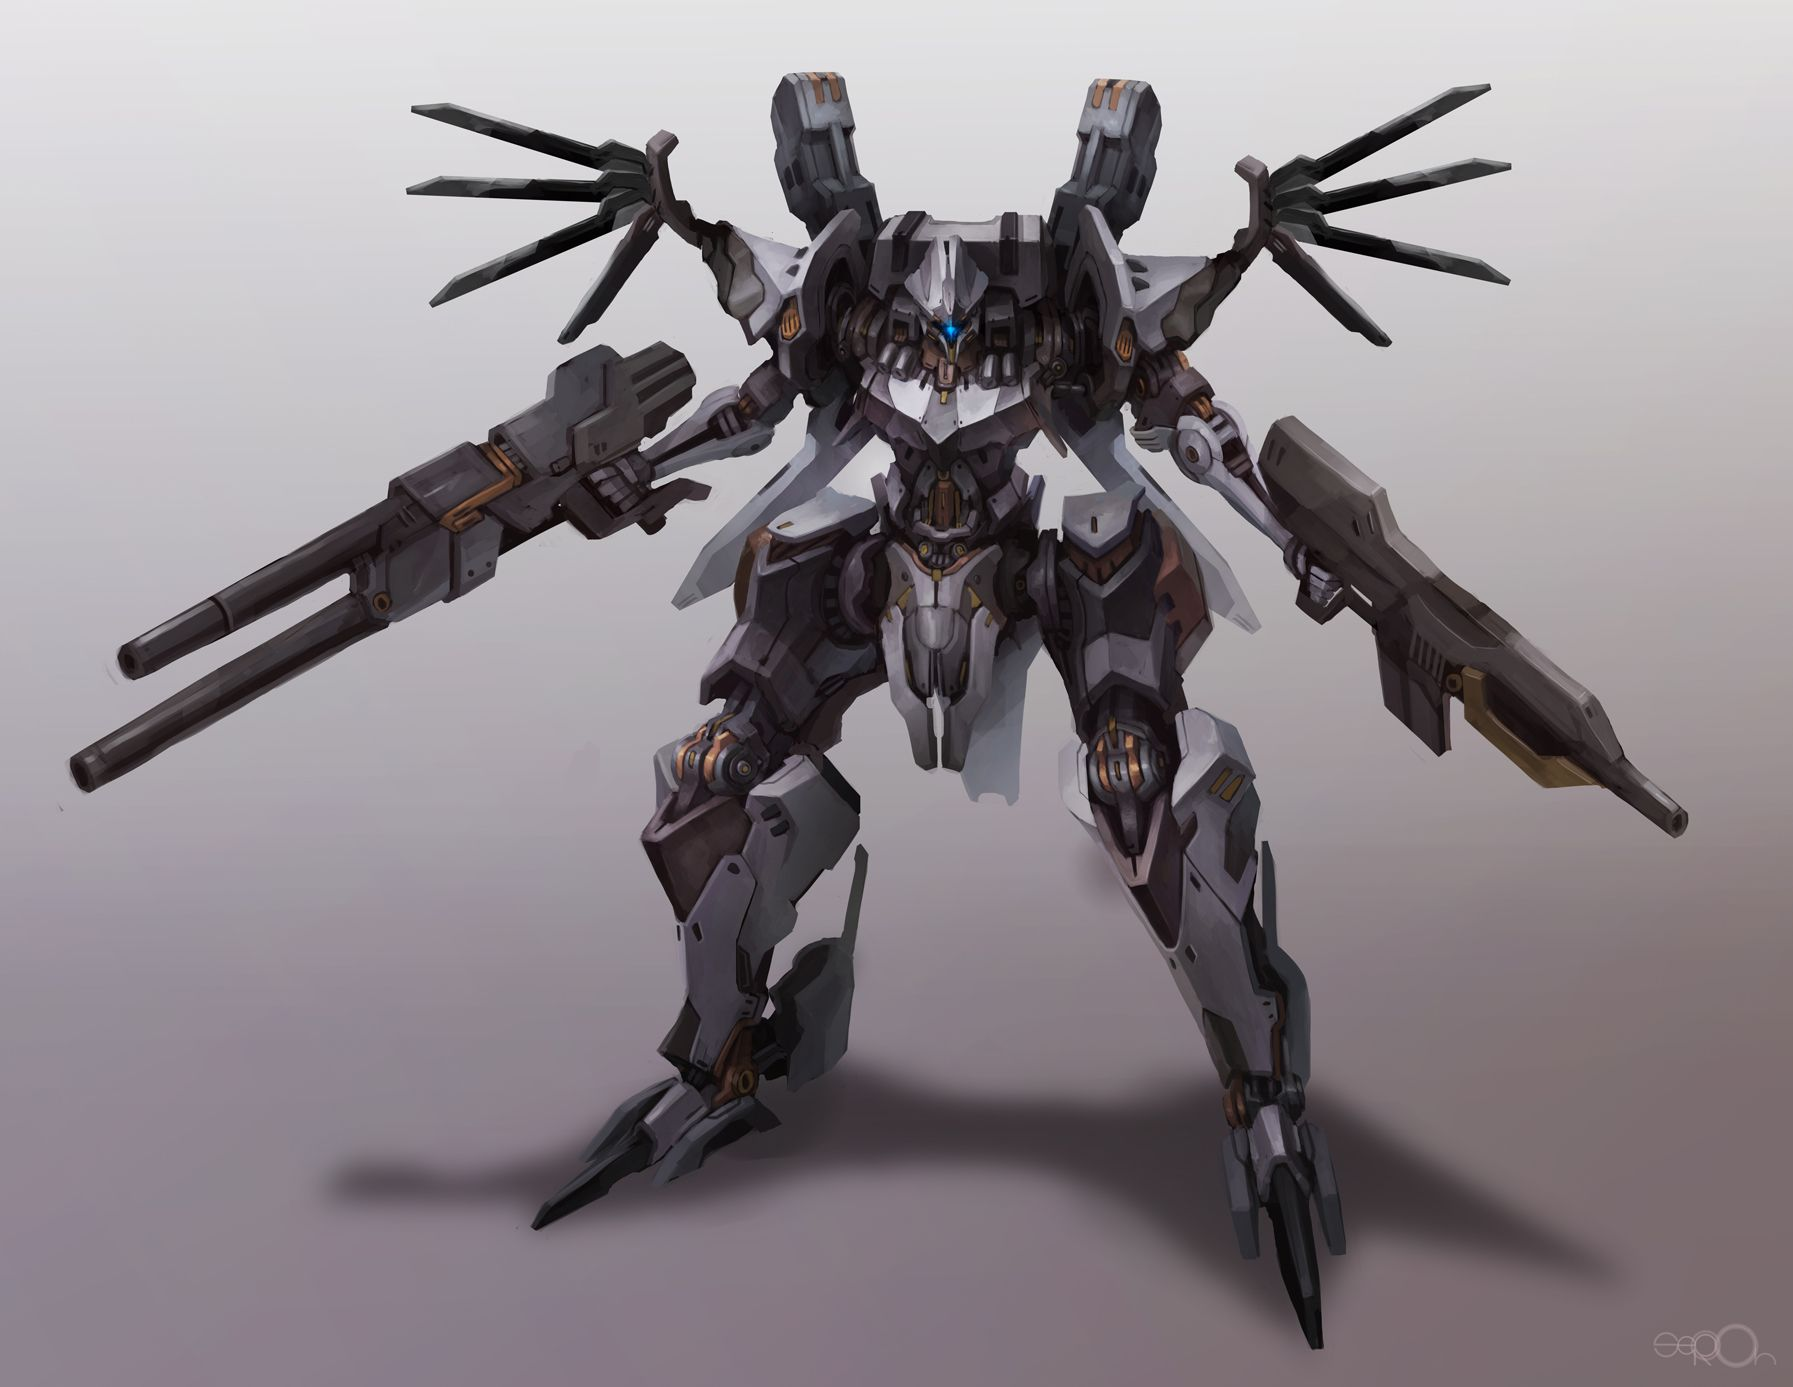 Armored core redesign by zgul-osr1113.deviantart.com on @deviantART